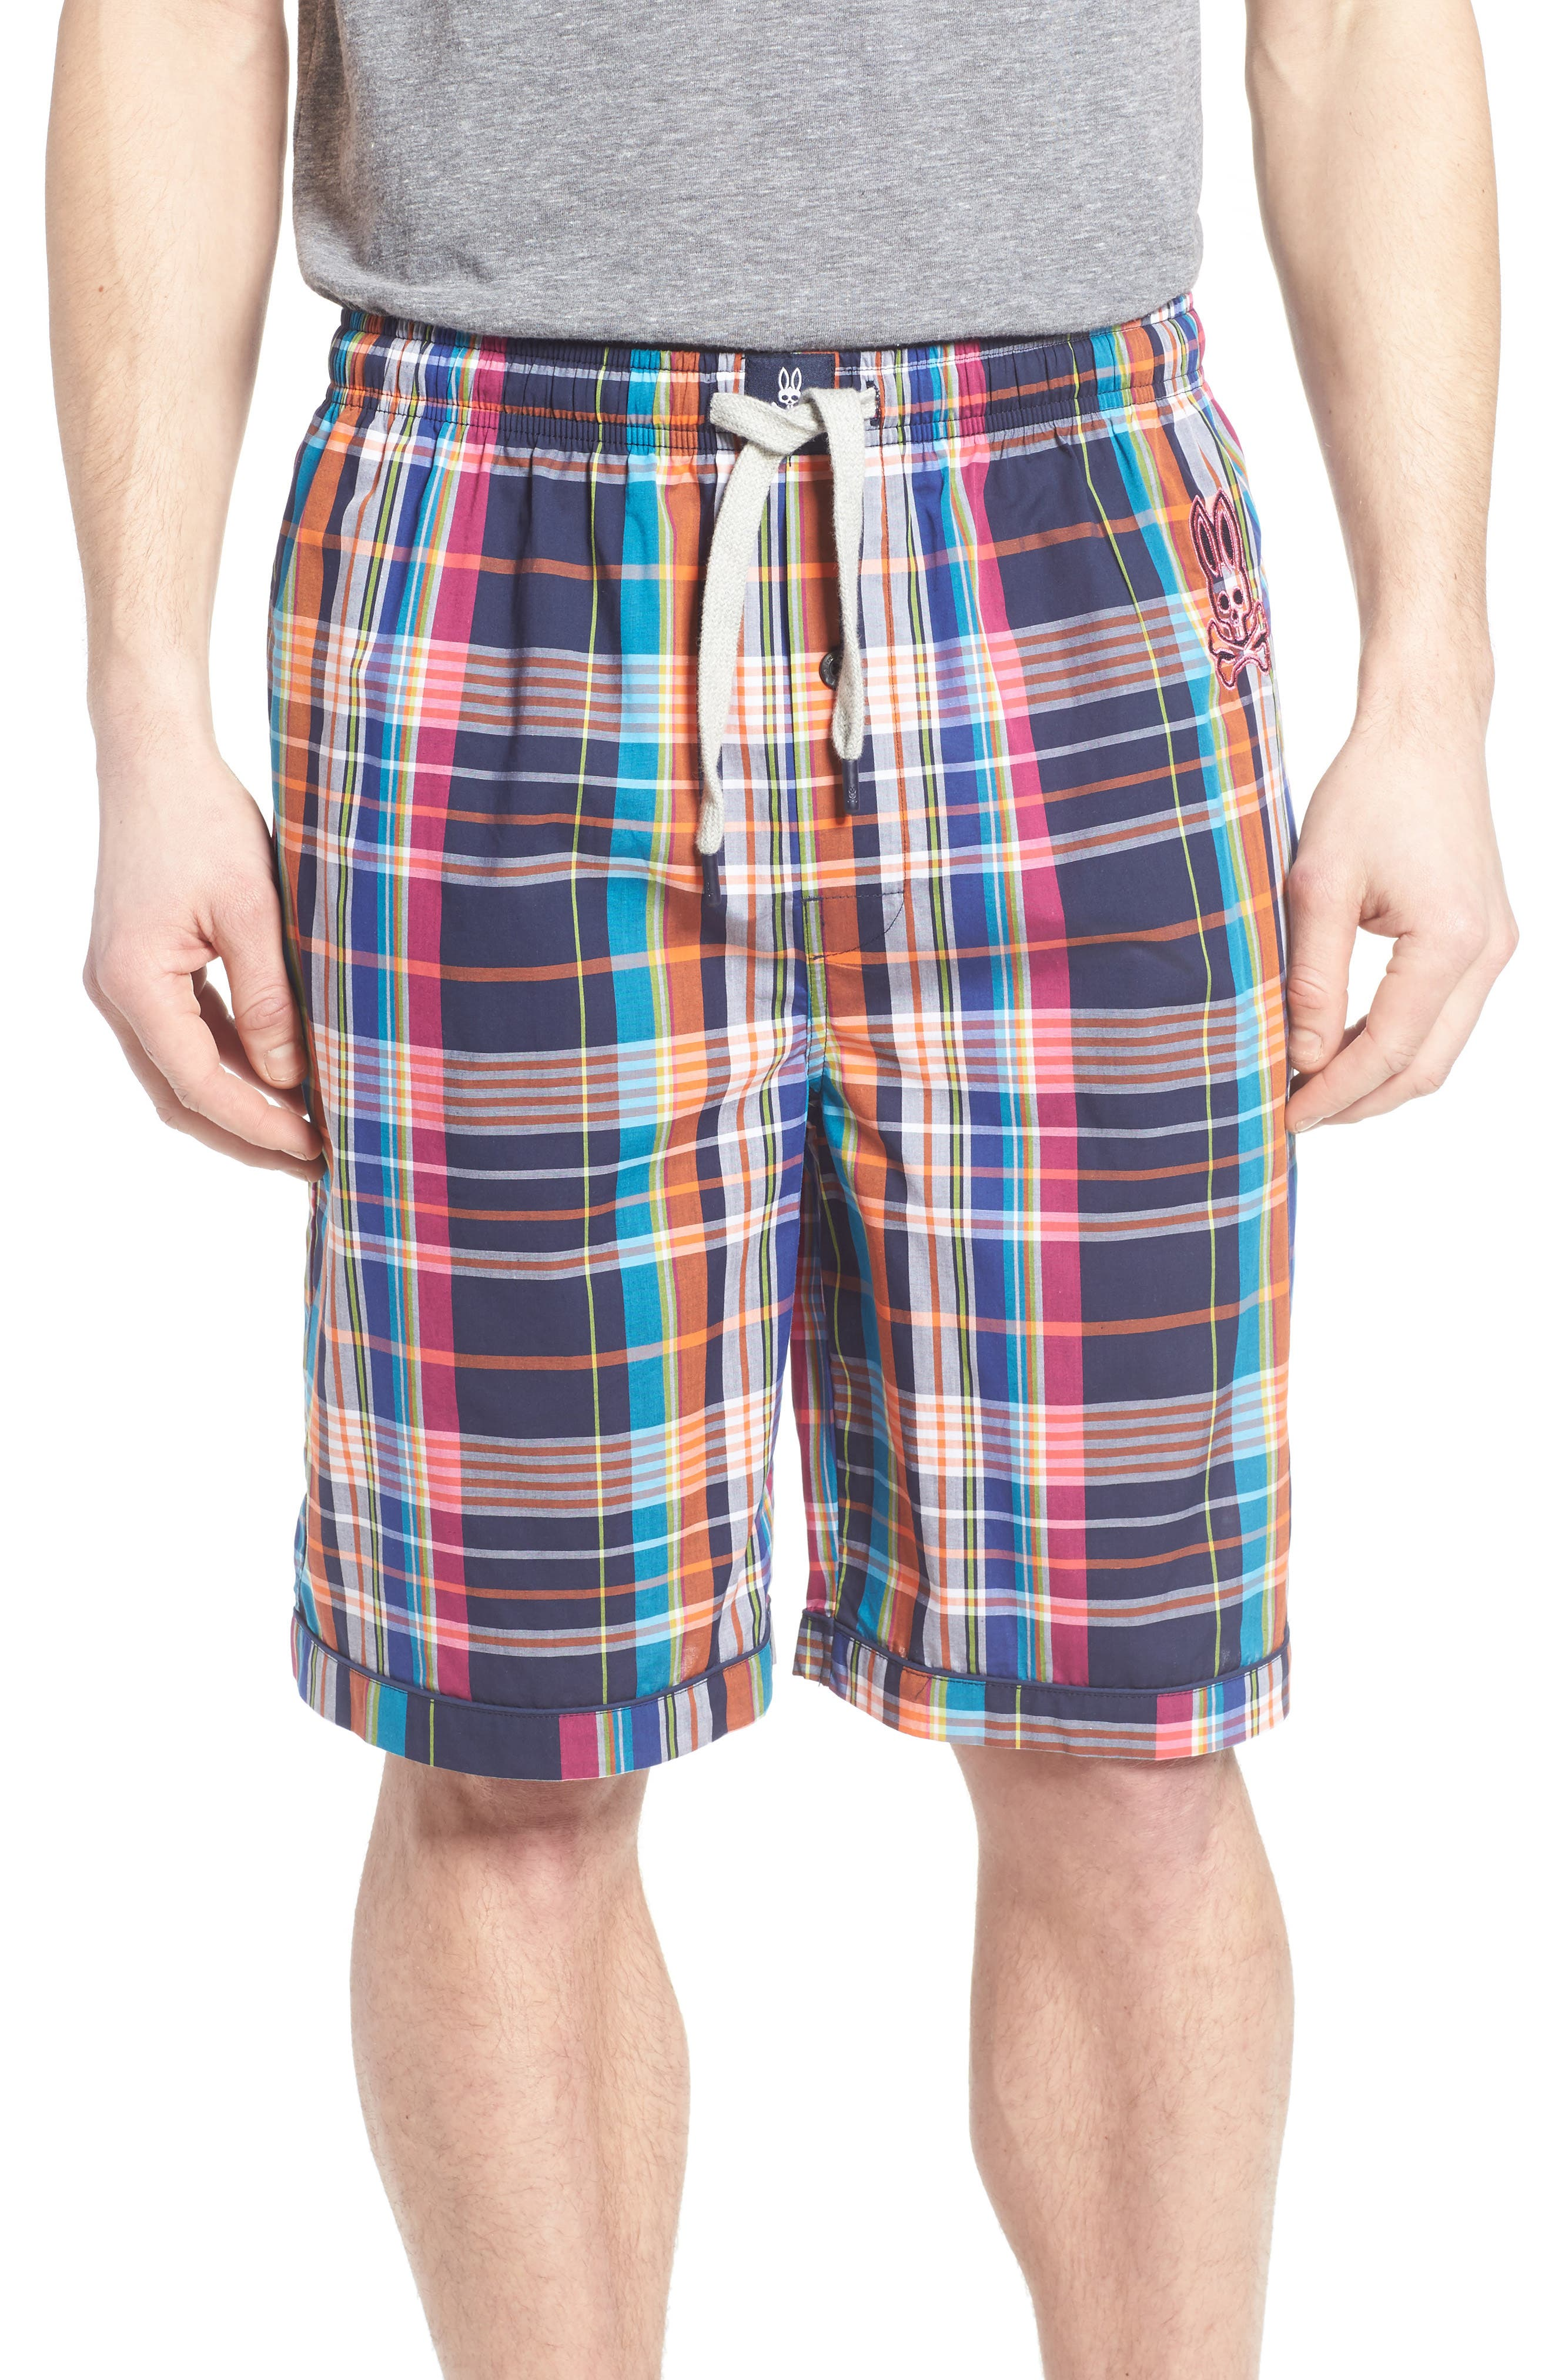 Cotton Lounge Shorts,                             Main thumbnail 1, color,                             001